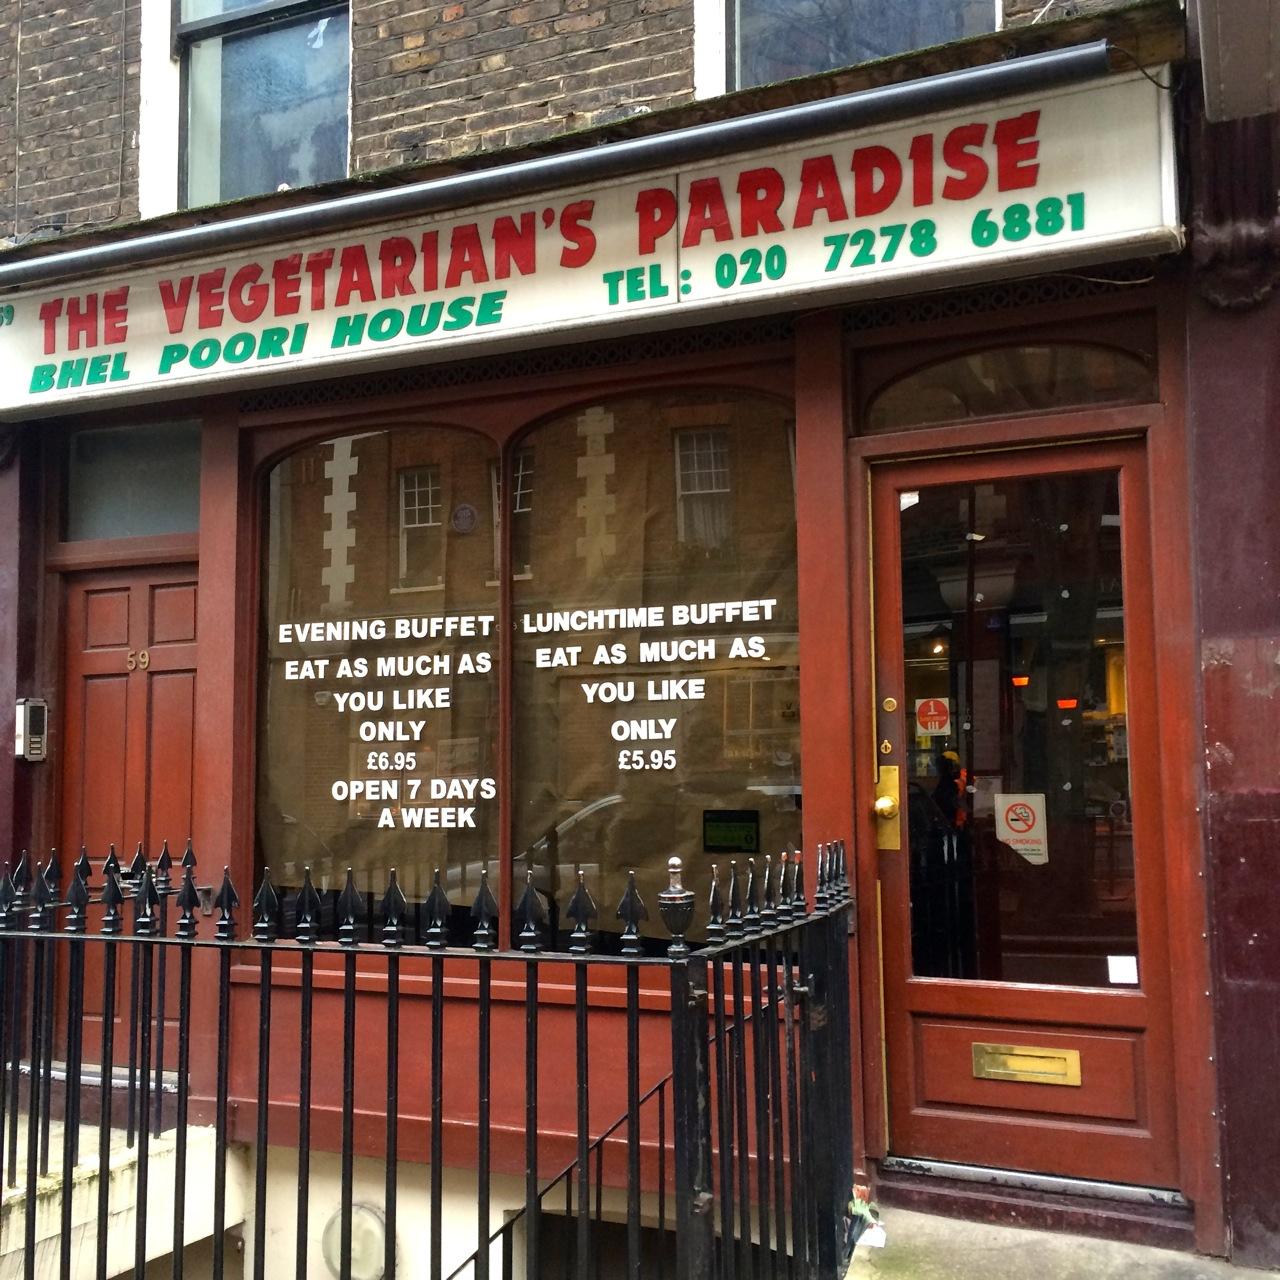 https://i1.wp.com/fatgayvegan.com/wp-content/uploads/2015/12/Vegetarian-Paradise-closed.jpg?fit=1280%2C1280